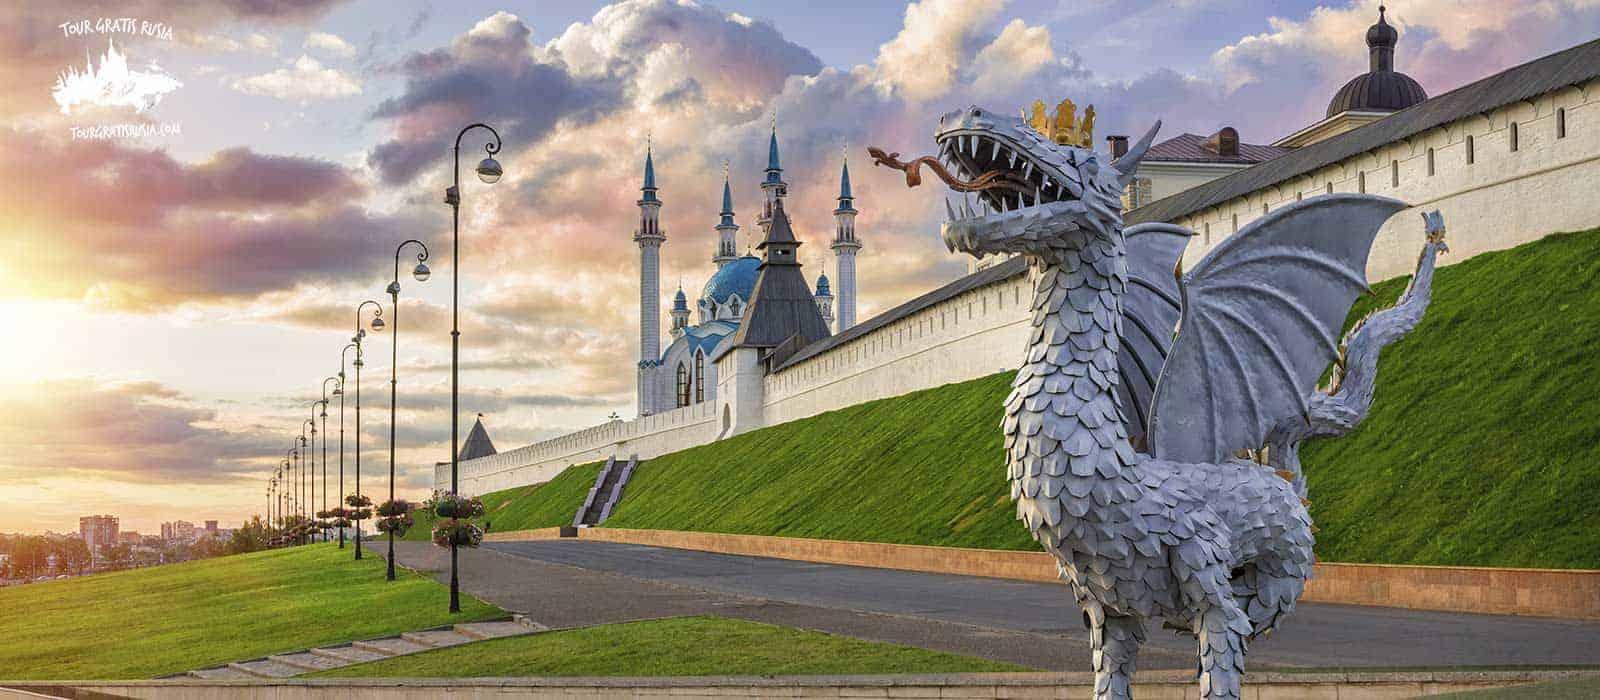 Tour centro historico de Kazan